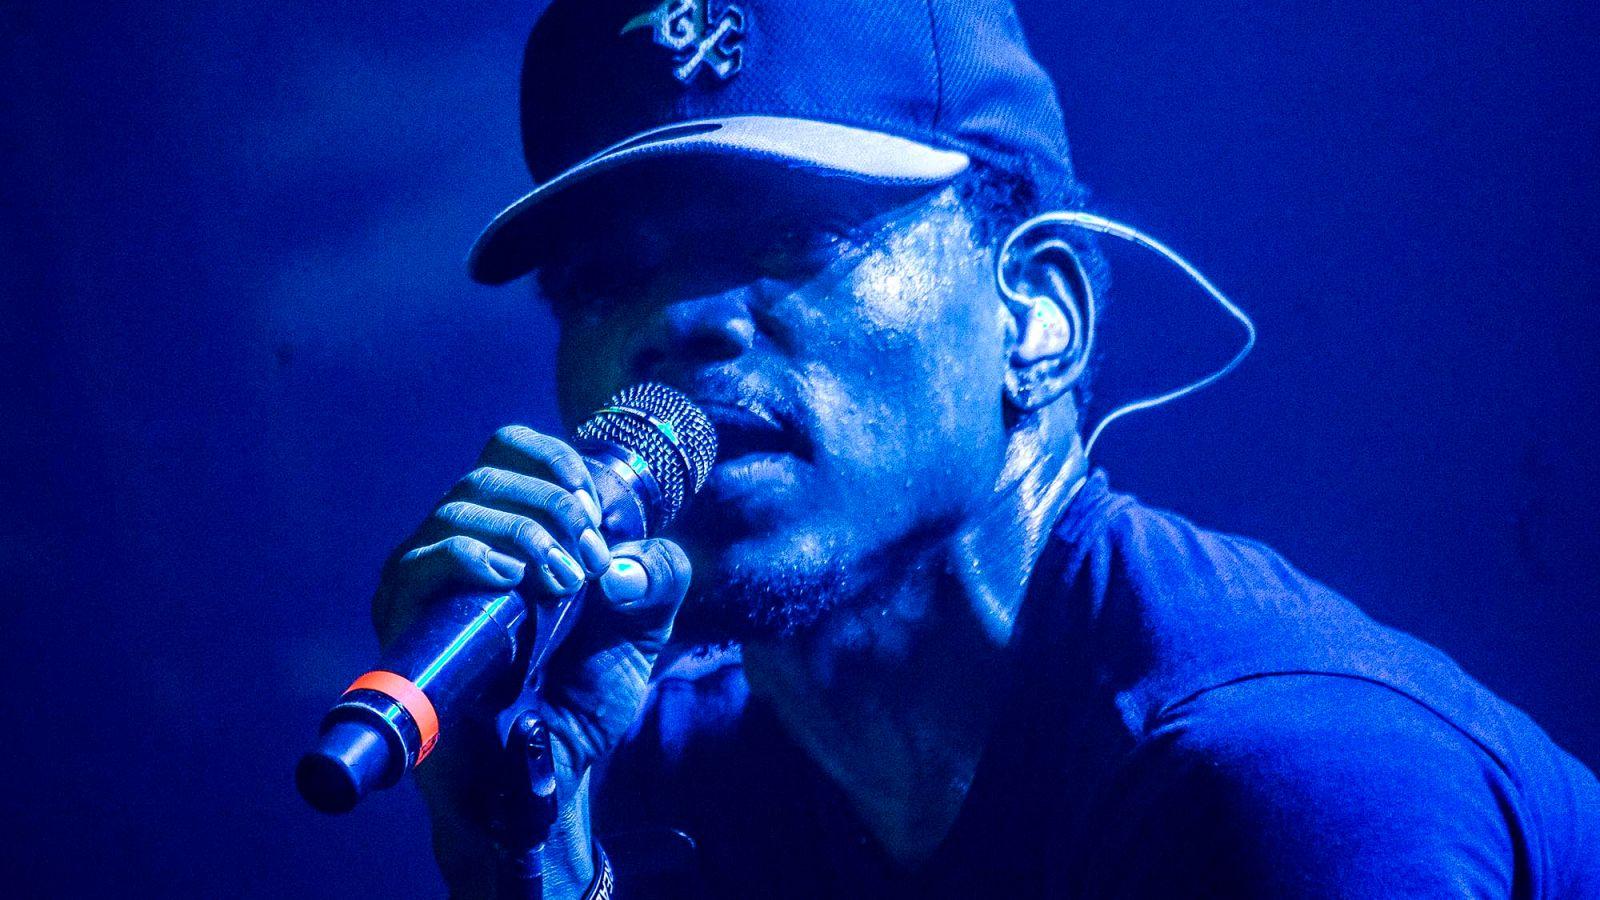 Chance The Rapper Clarifies He From Chicago https://t.co/CRWhDWxseq https://t.co/lSaDcvVPof